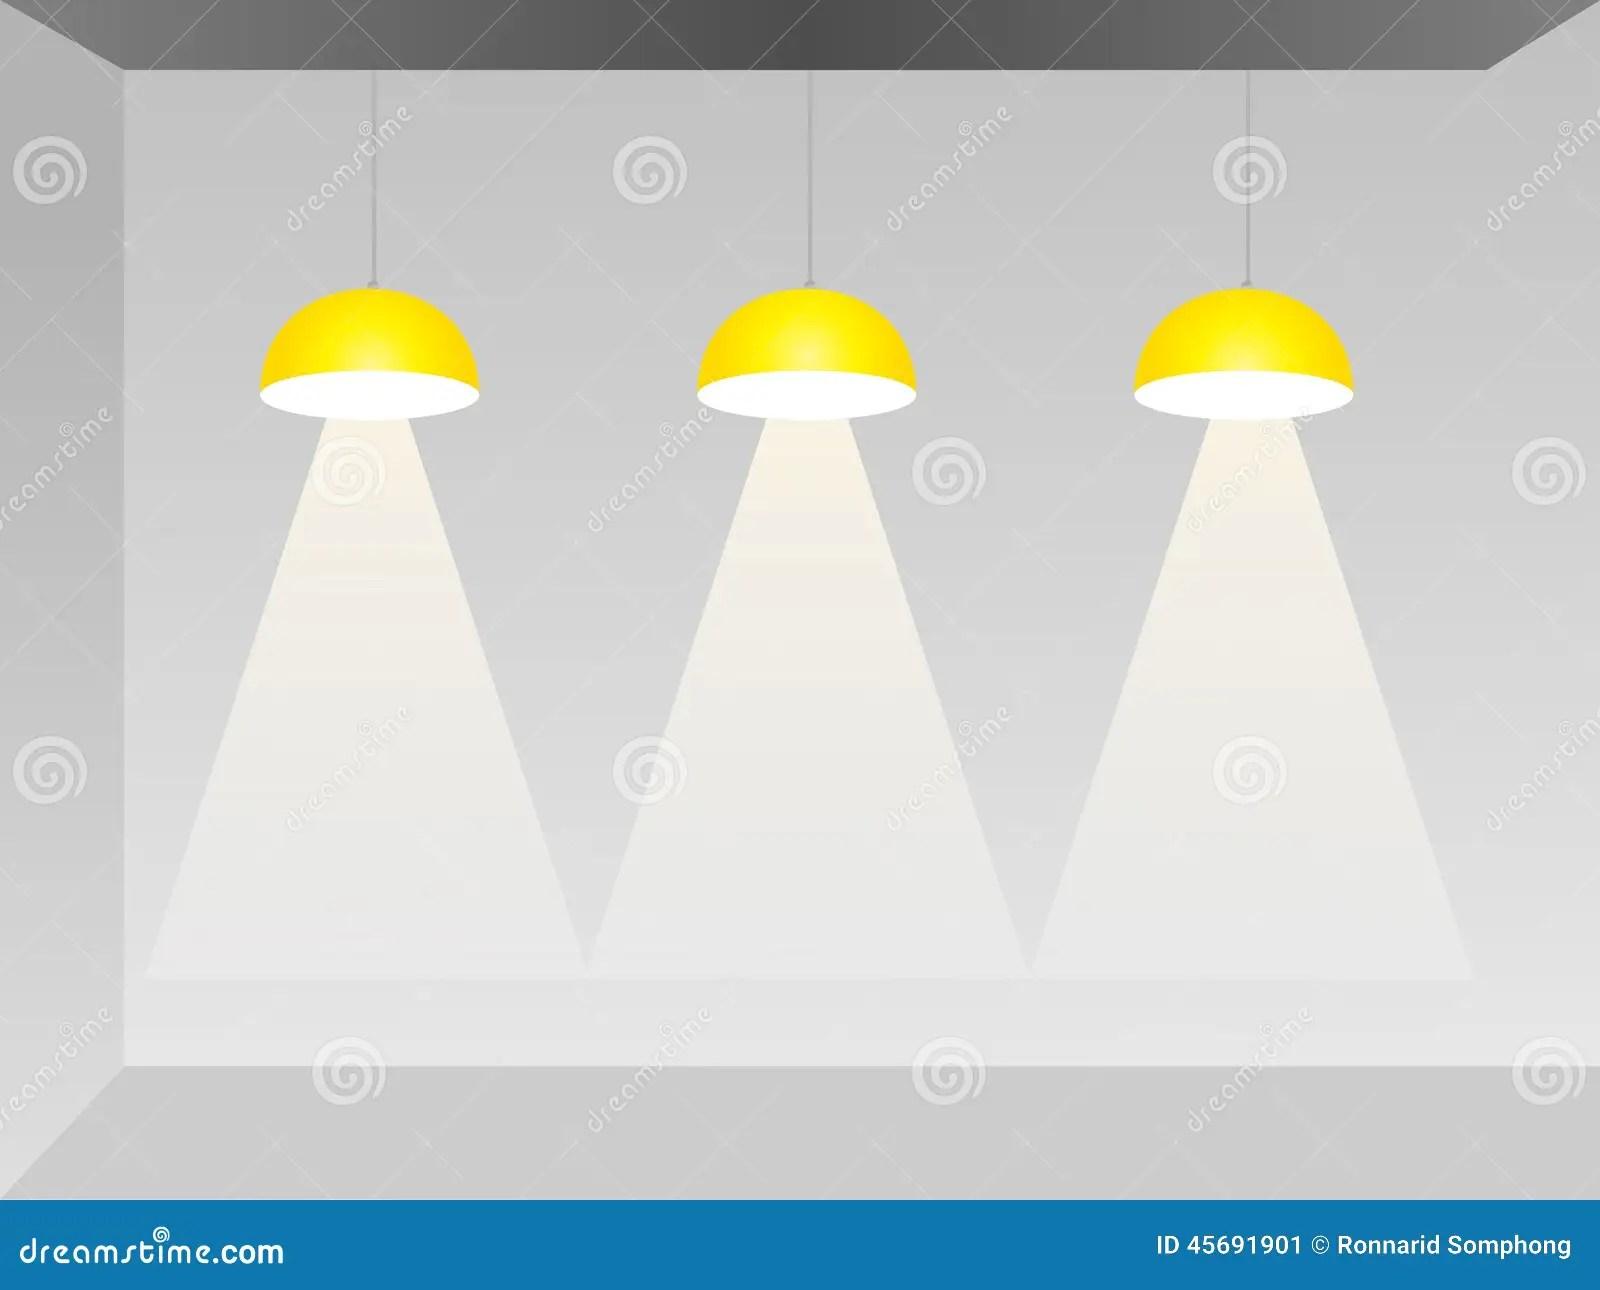 Downlight Cartoons Illustrations Amp Vector Stock Images